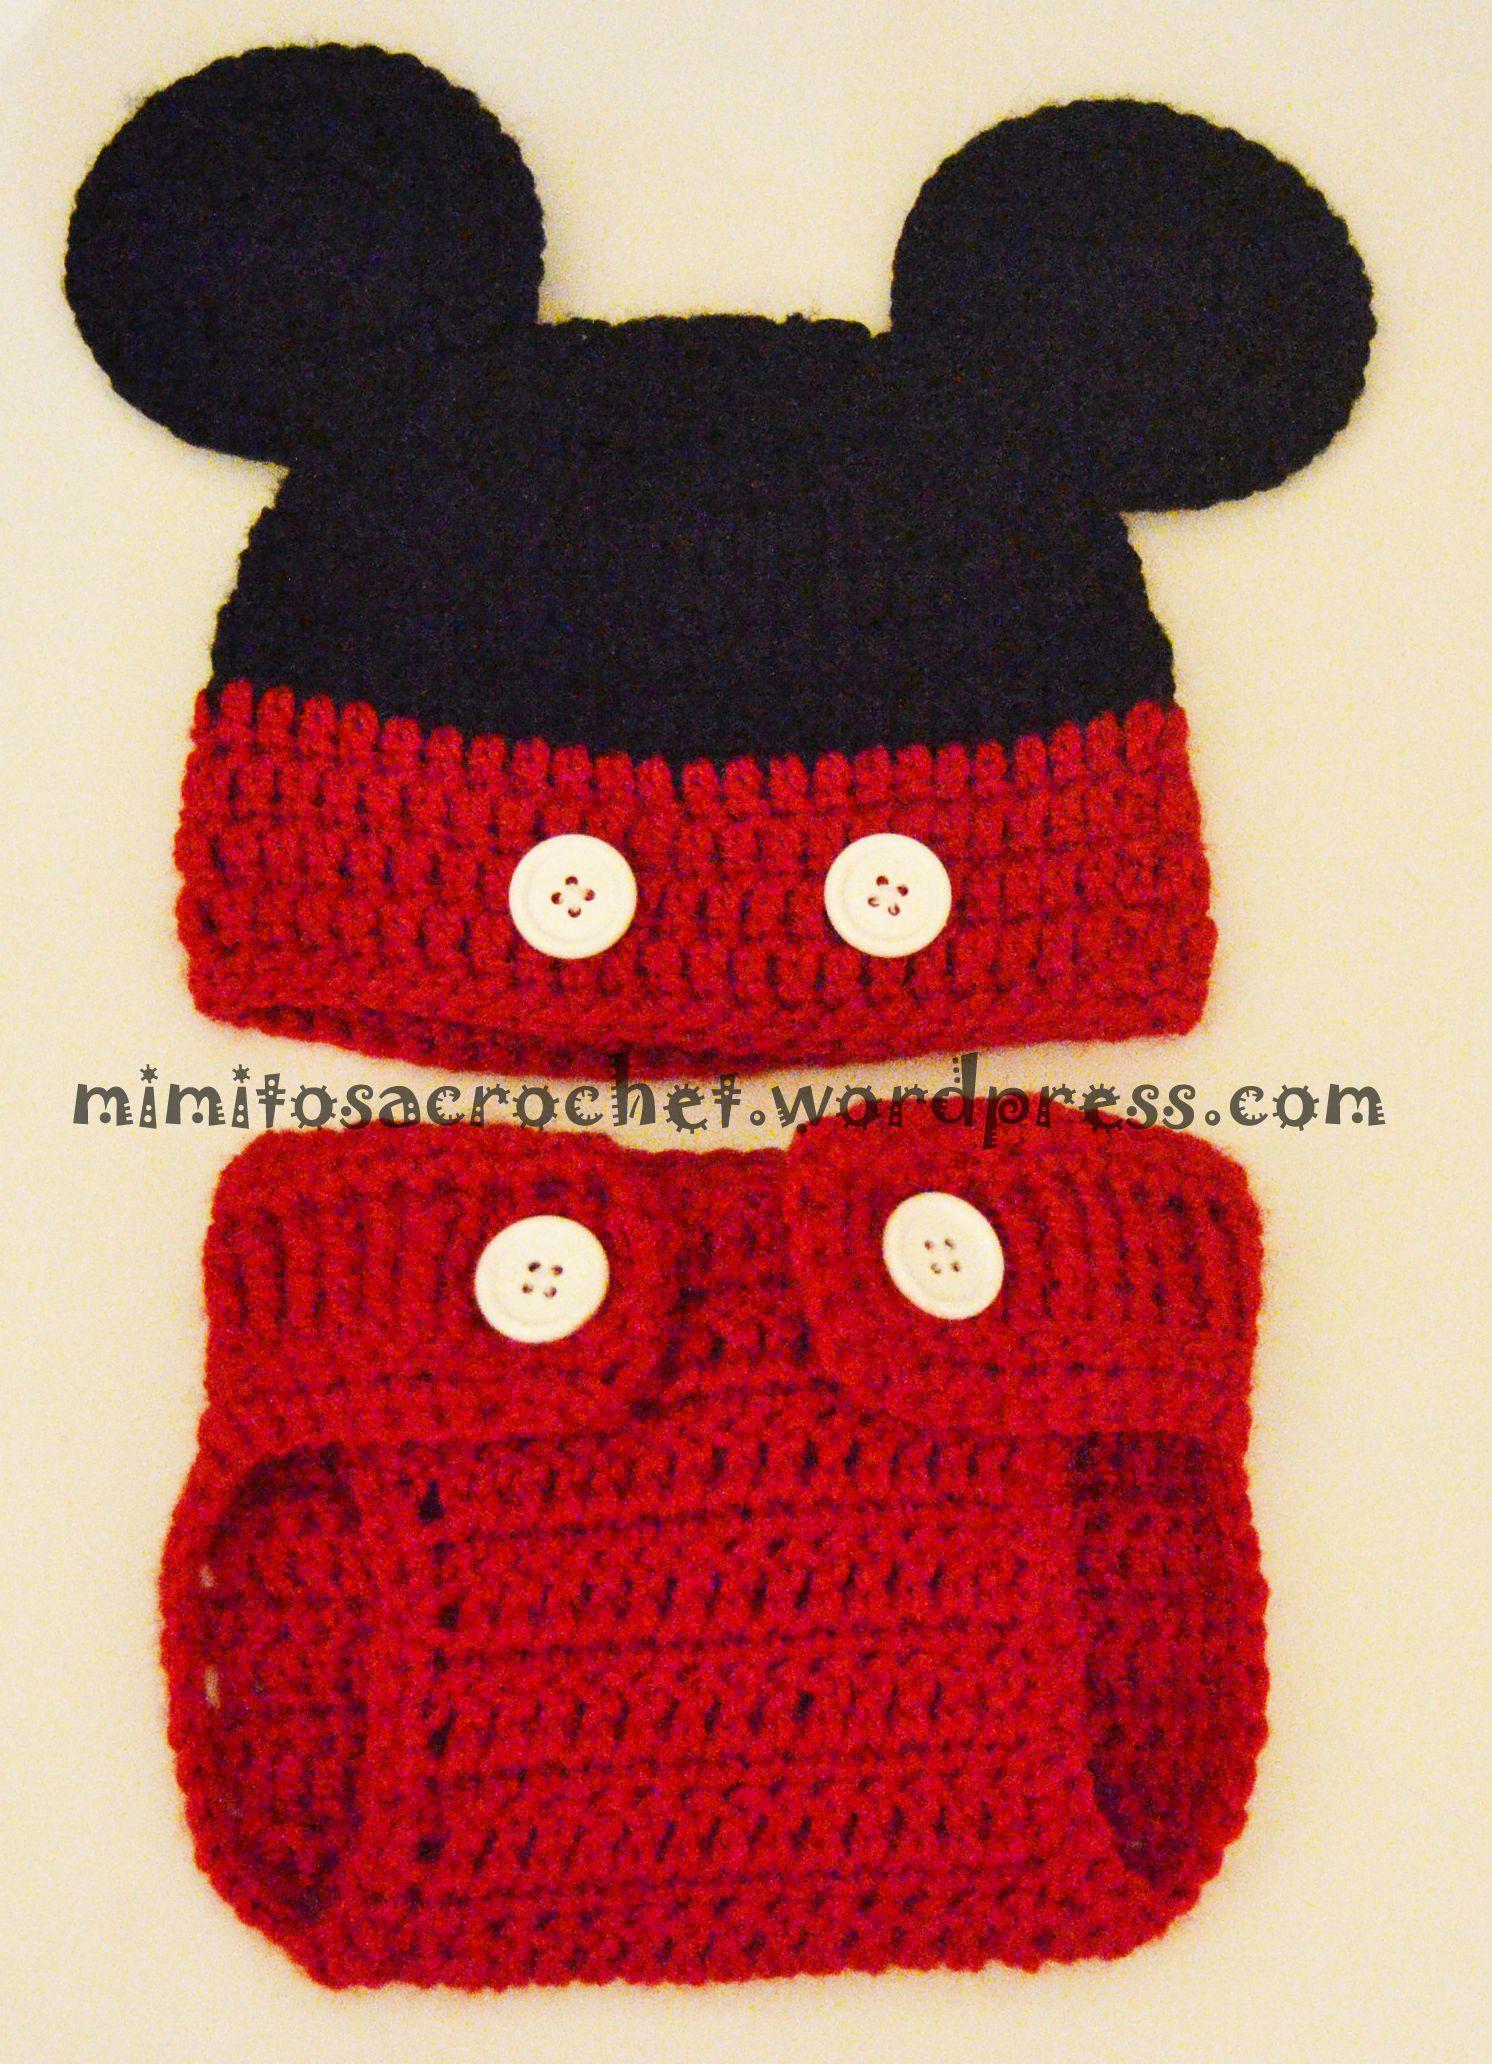 Cubrepañales a crochet | Mimitos a Crochet | Tejido crochet ...